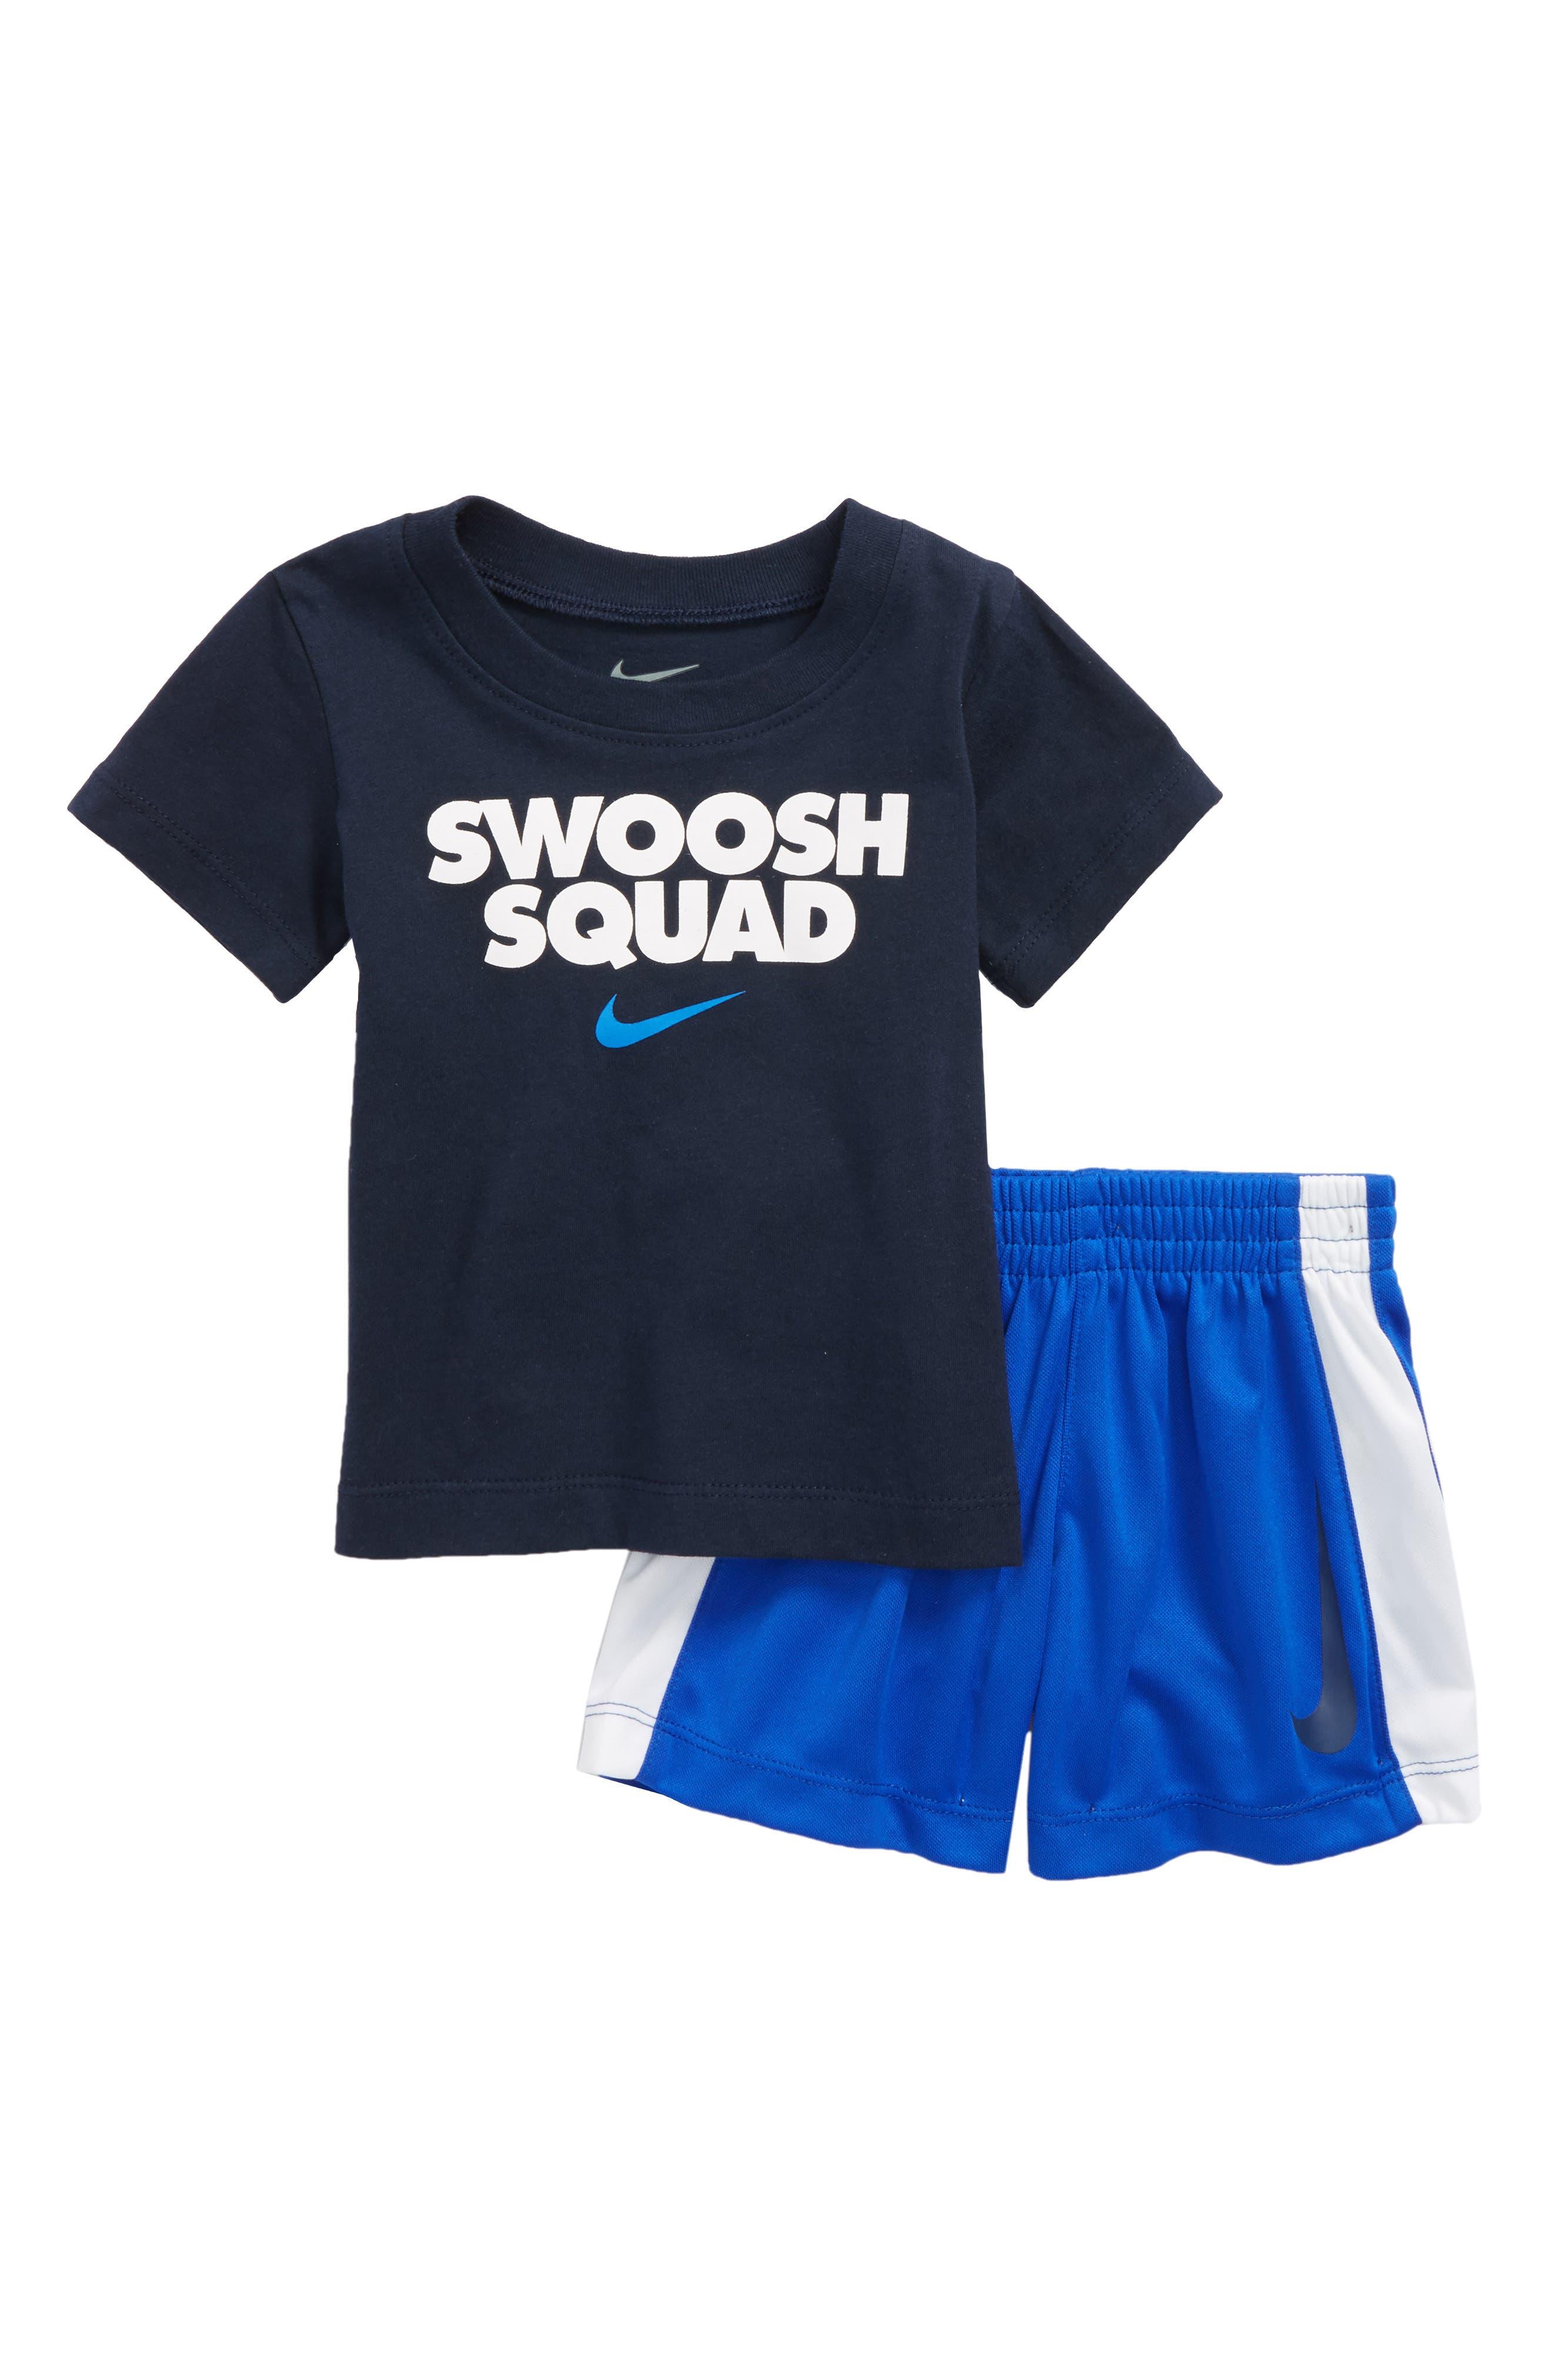 Swoosh Squad T-Shirt & Shorts Set,                         Main,                         color,